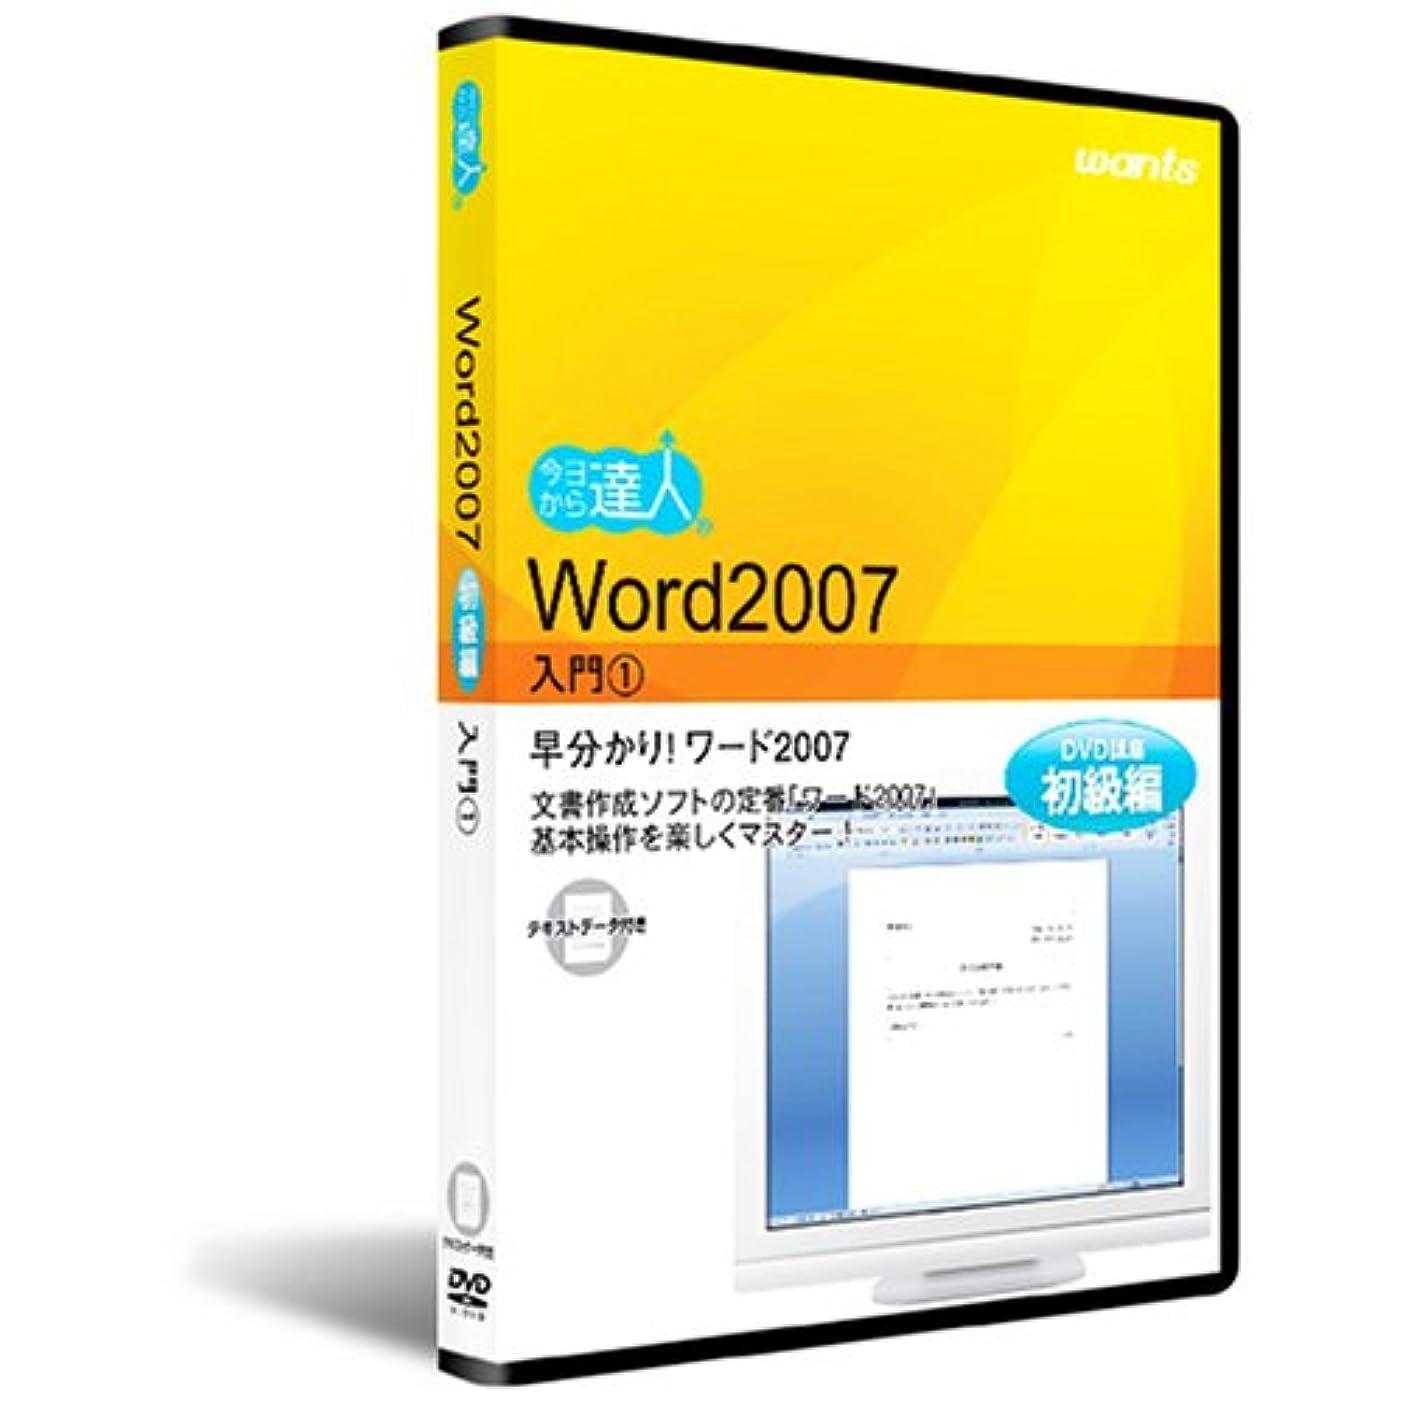 歯車キャスト格差Word2007:DVD講座 初級編 入門1